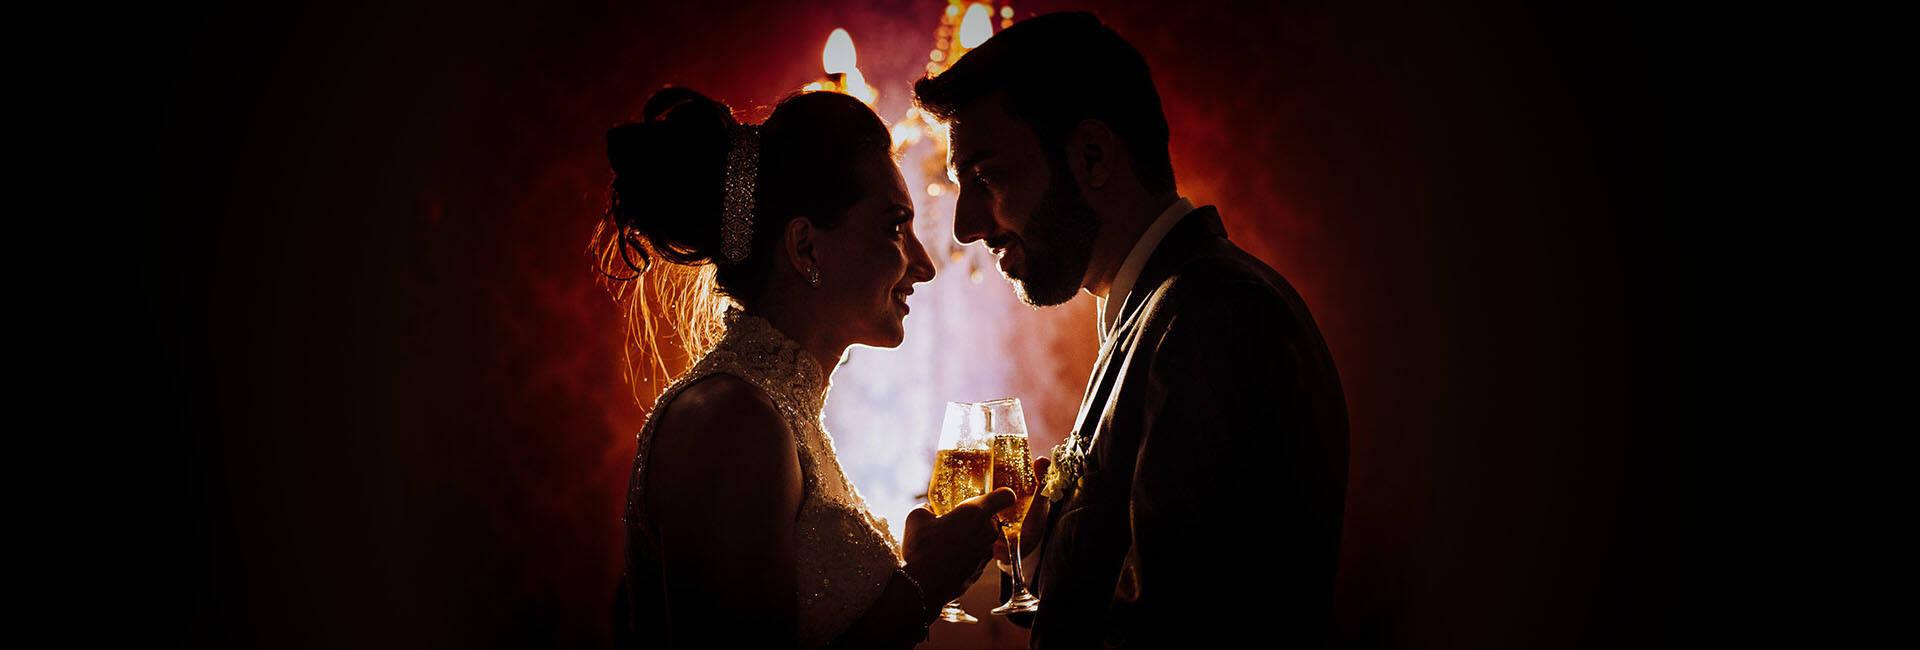 Casamento de Lainara e Gustavo